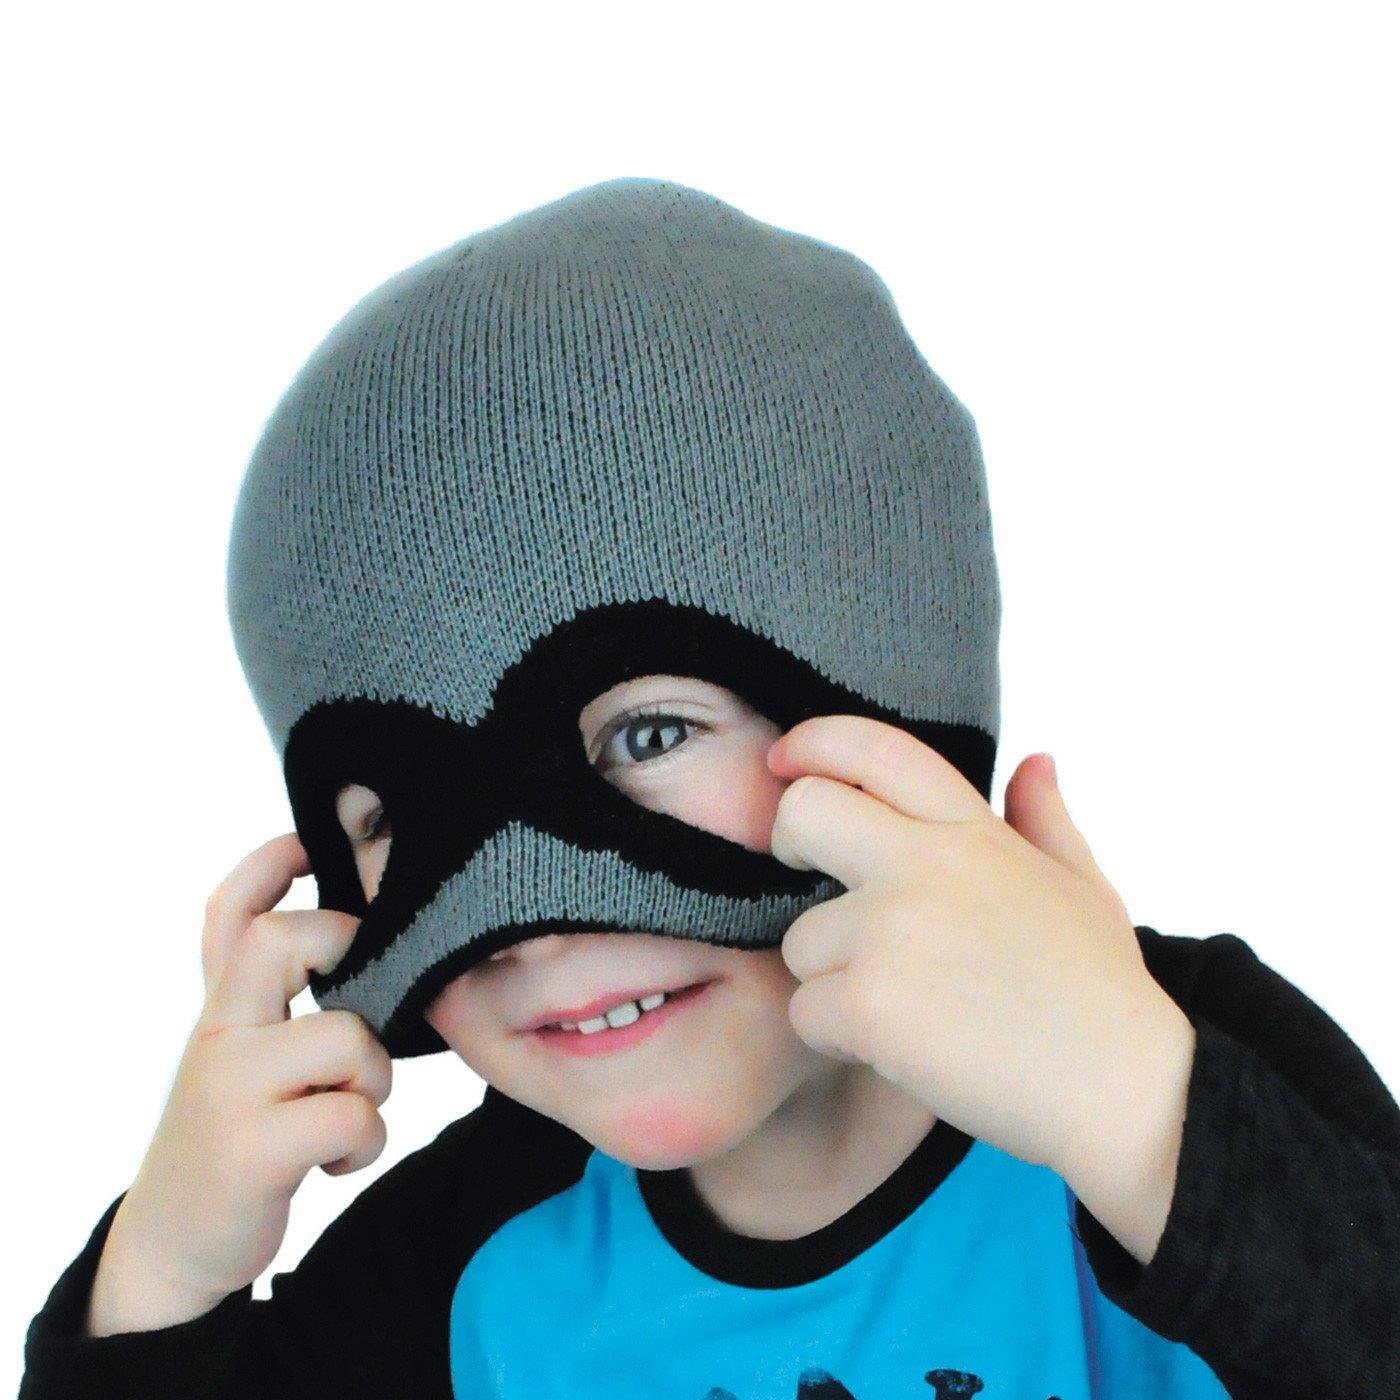 Boys Knit Bandit Mask Beanie - Warm Kids ski Snowboard Winter Fun Cute Christmas